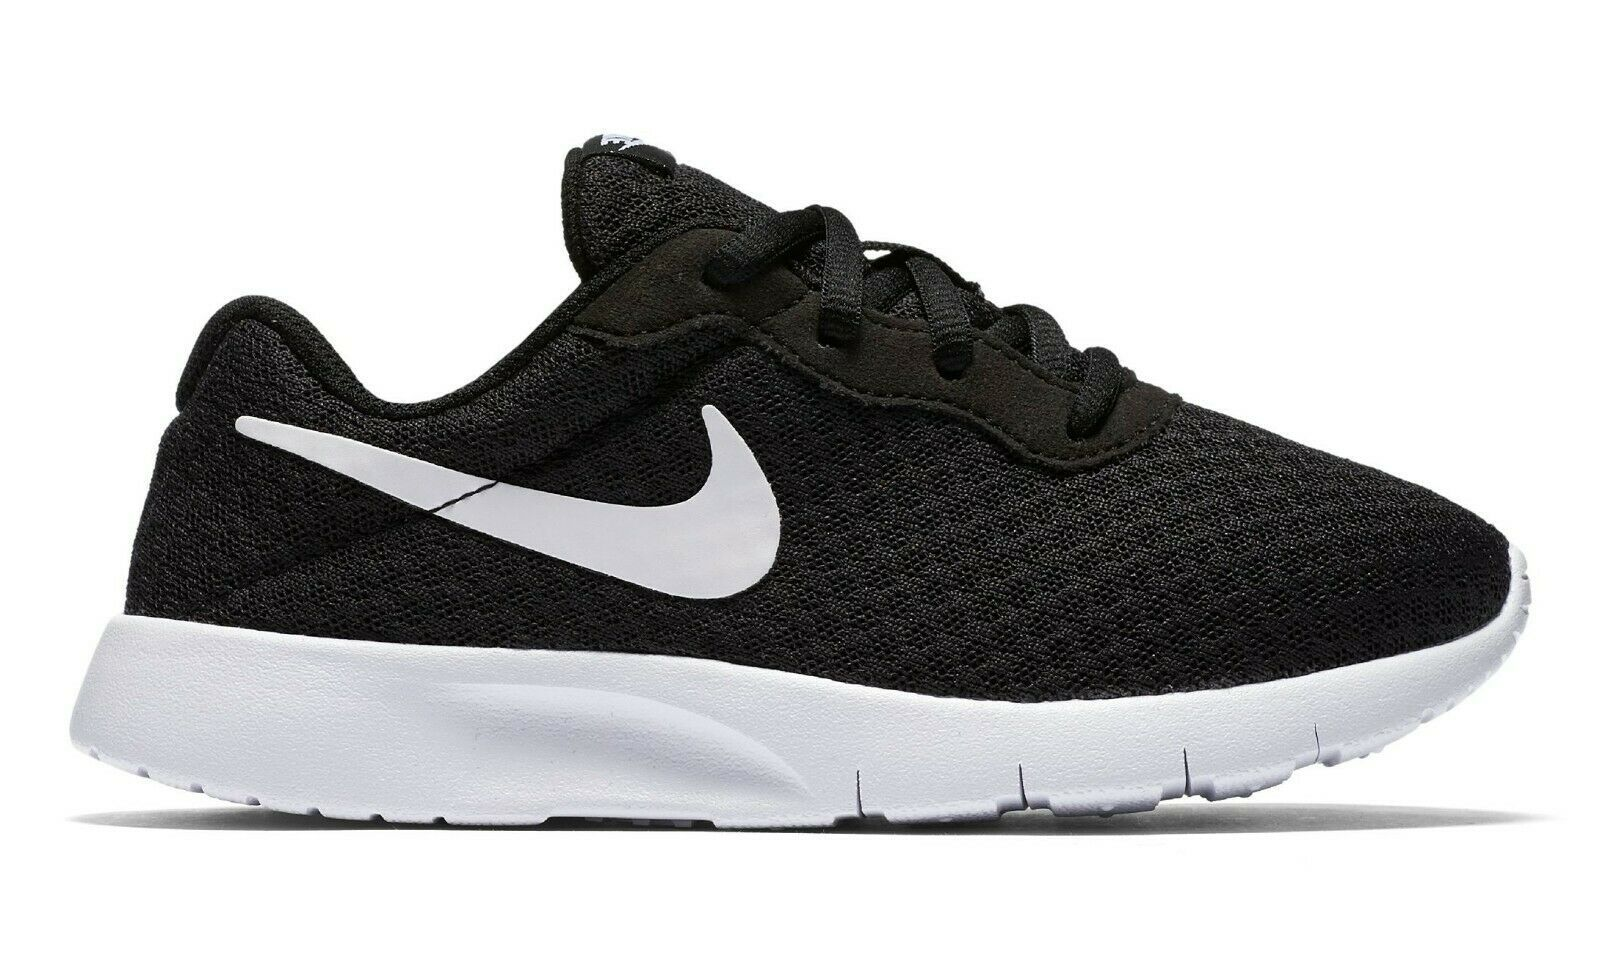 Nike Preschool Tanjun Casual Shoes Black/White 818382-011